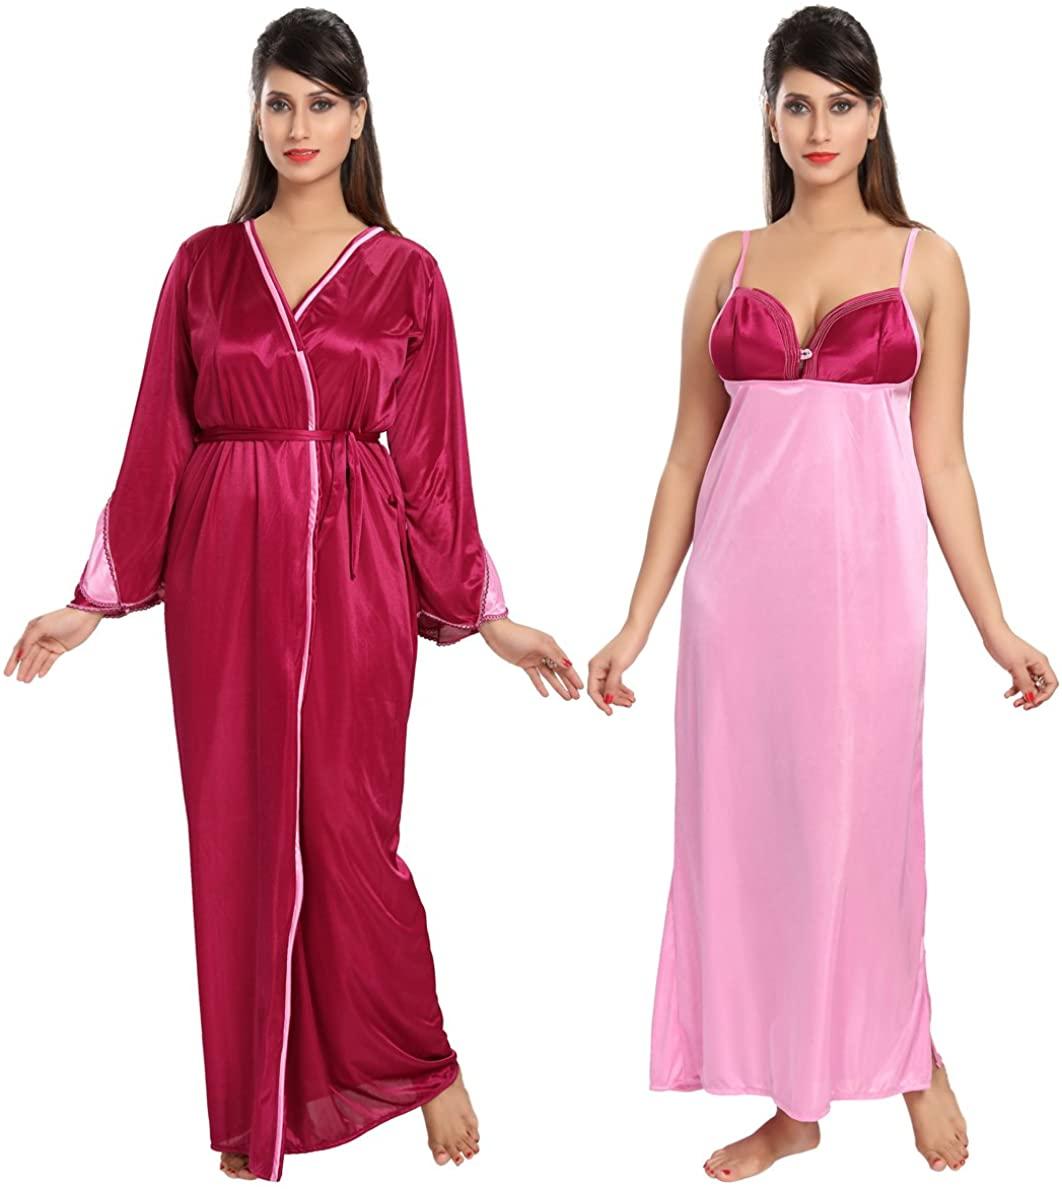 Be You Fashion Women Satin Maroon Solid 2 piece Nighty Set